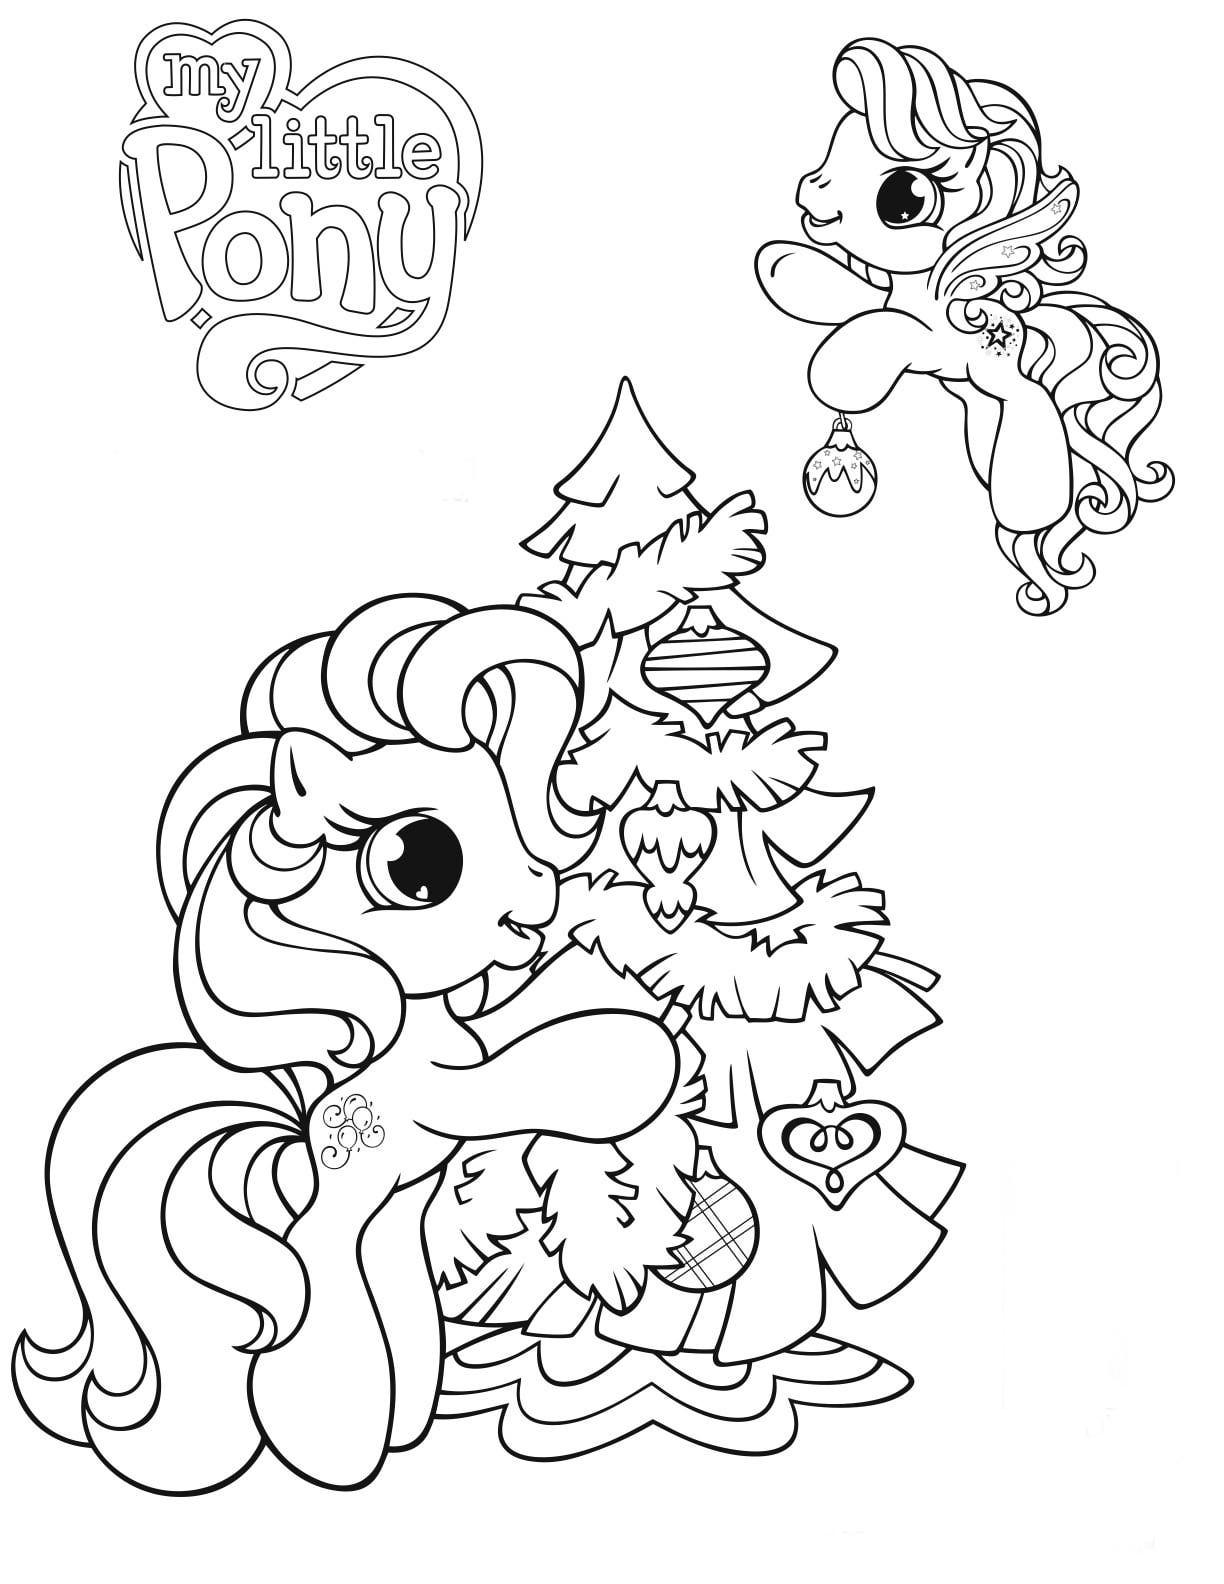 Dibujos Para Colorear E Imprimir My Little Pony ~ Ideas Creativas ...